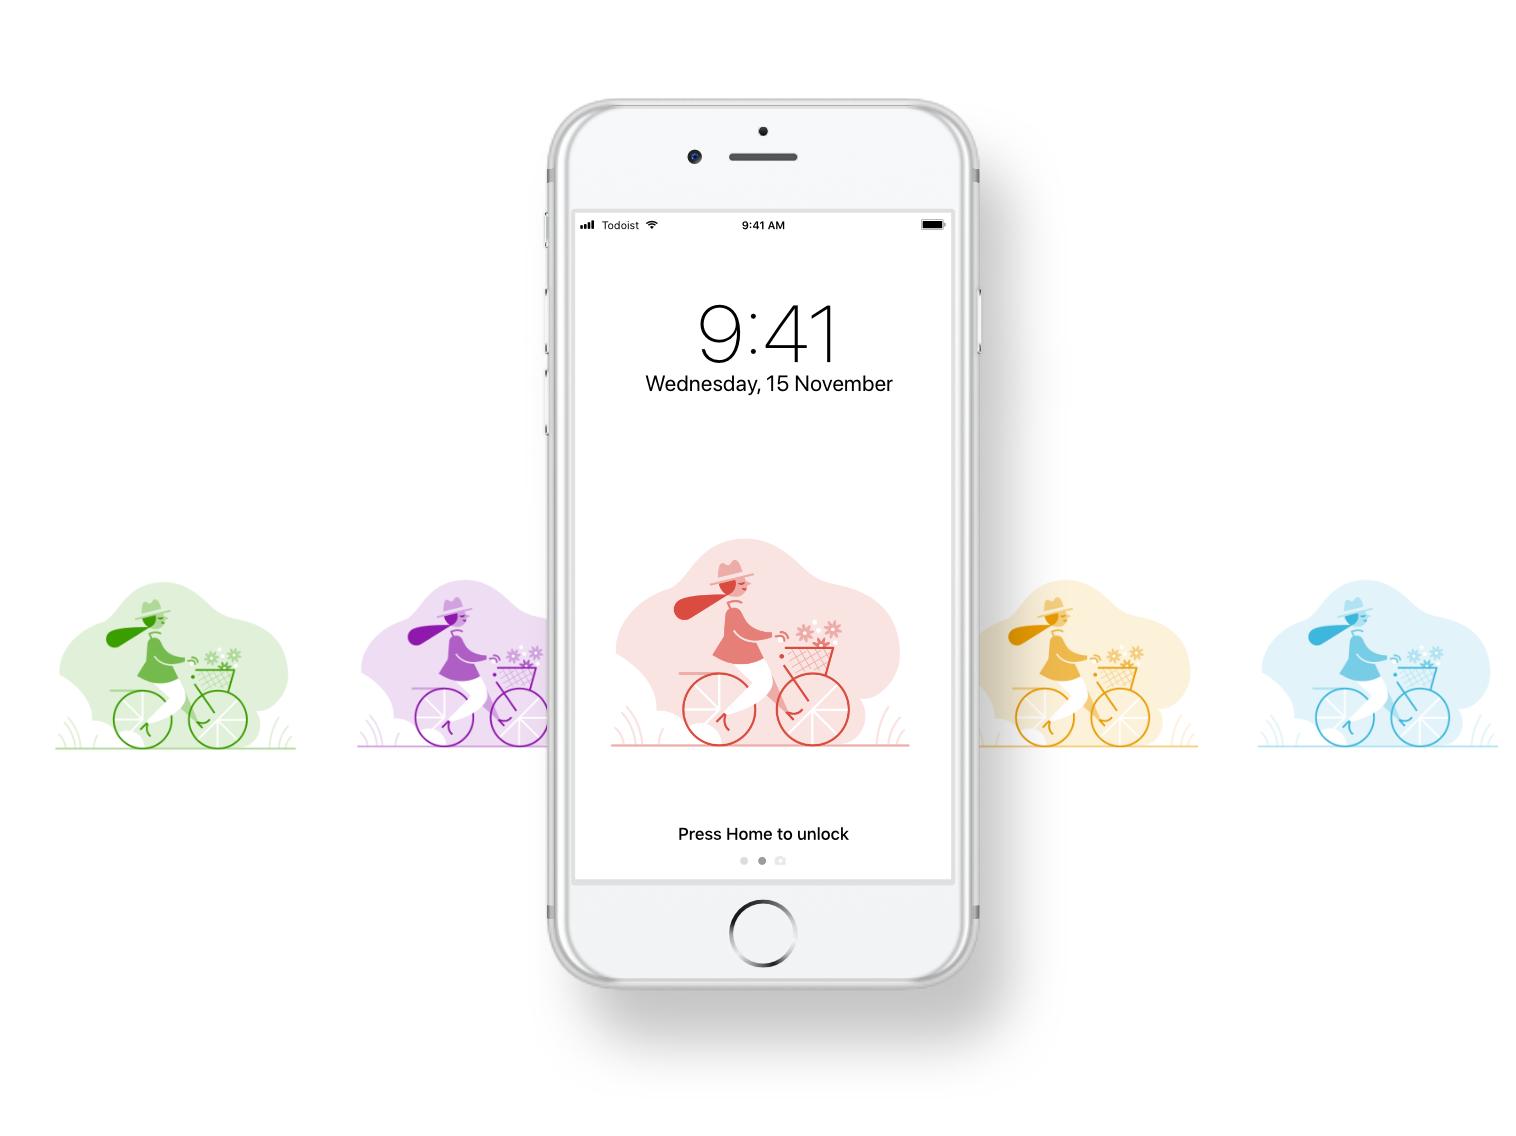 New Todoist Zero Wallpapers iphone desktop ipad android download free theme wallpaper illustration